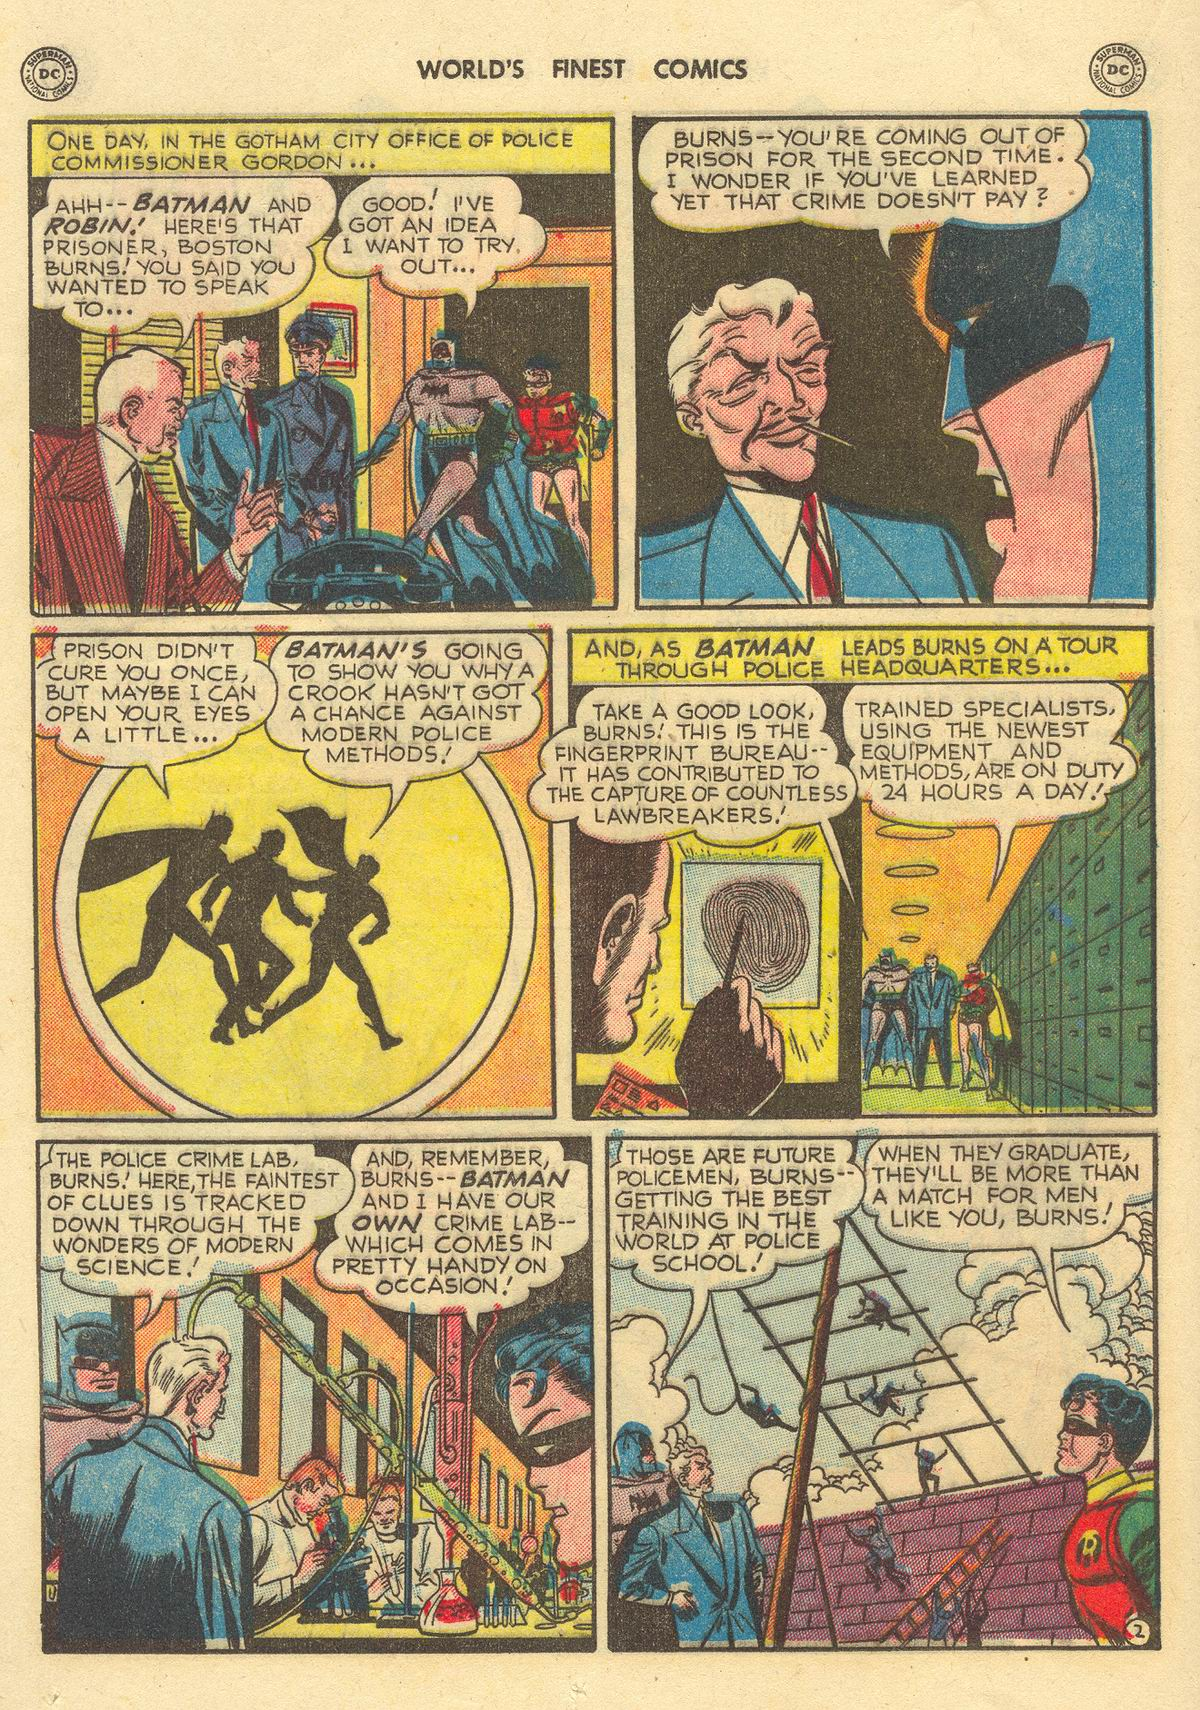 Read online World's Finest Comics comic -  Issue #51 - 64